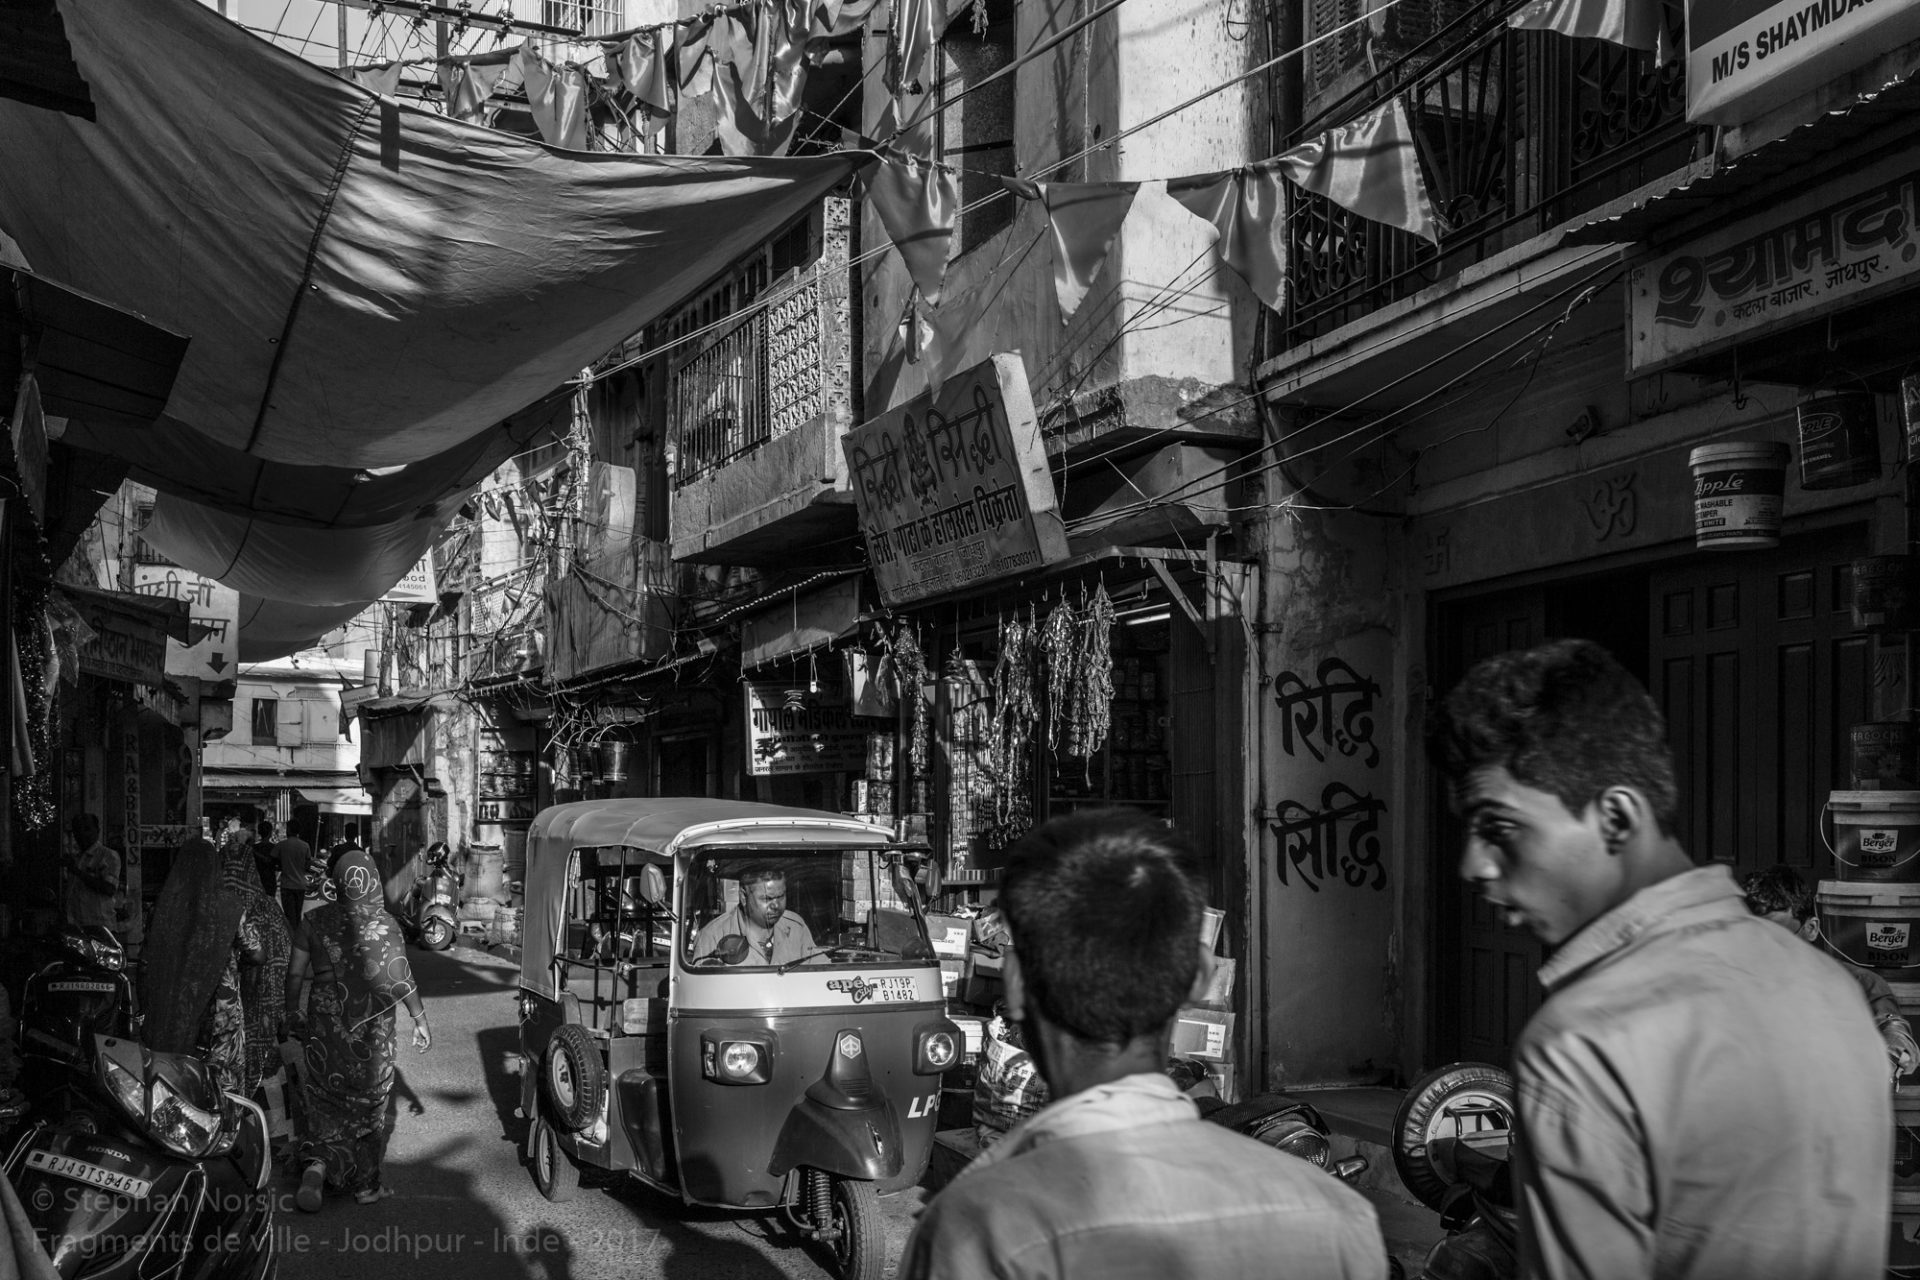 Fragments de ville : en Inde